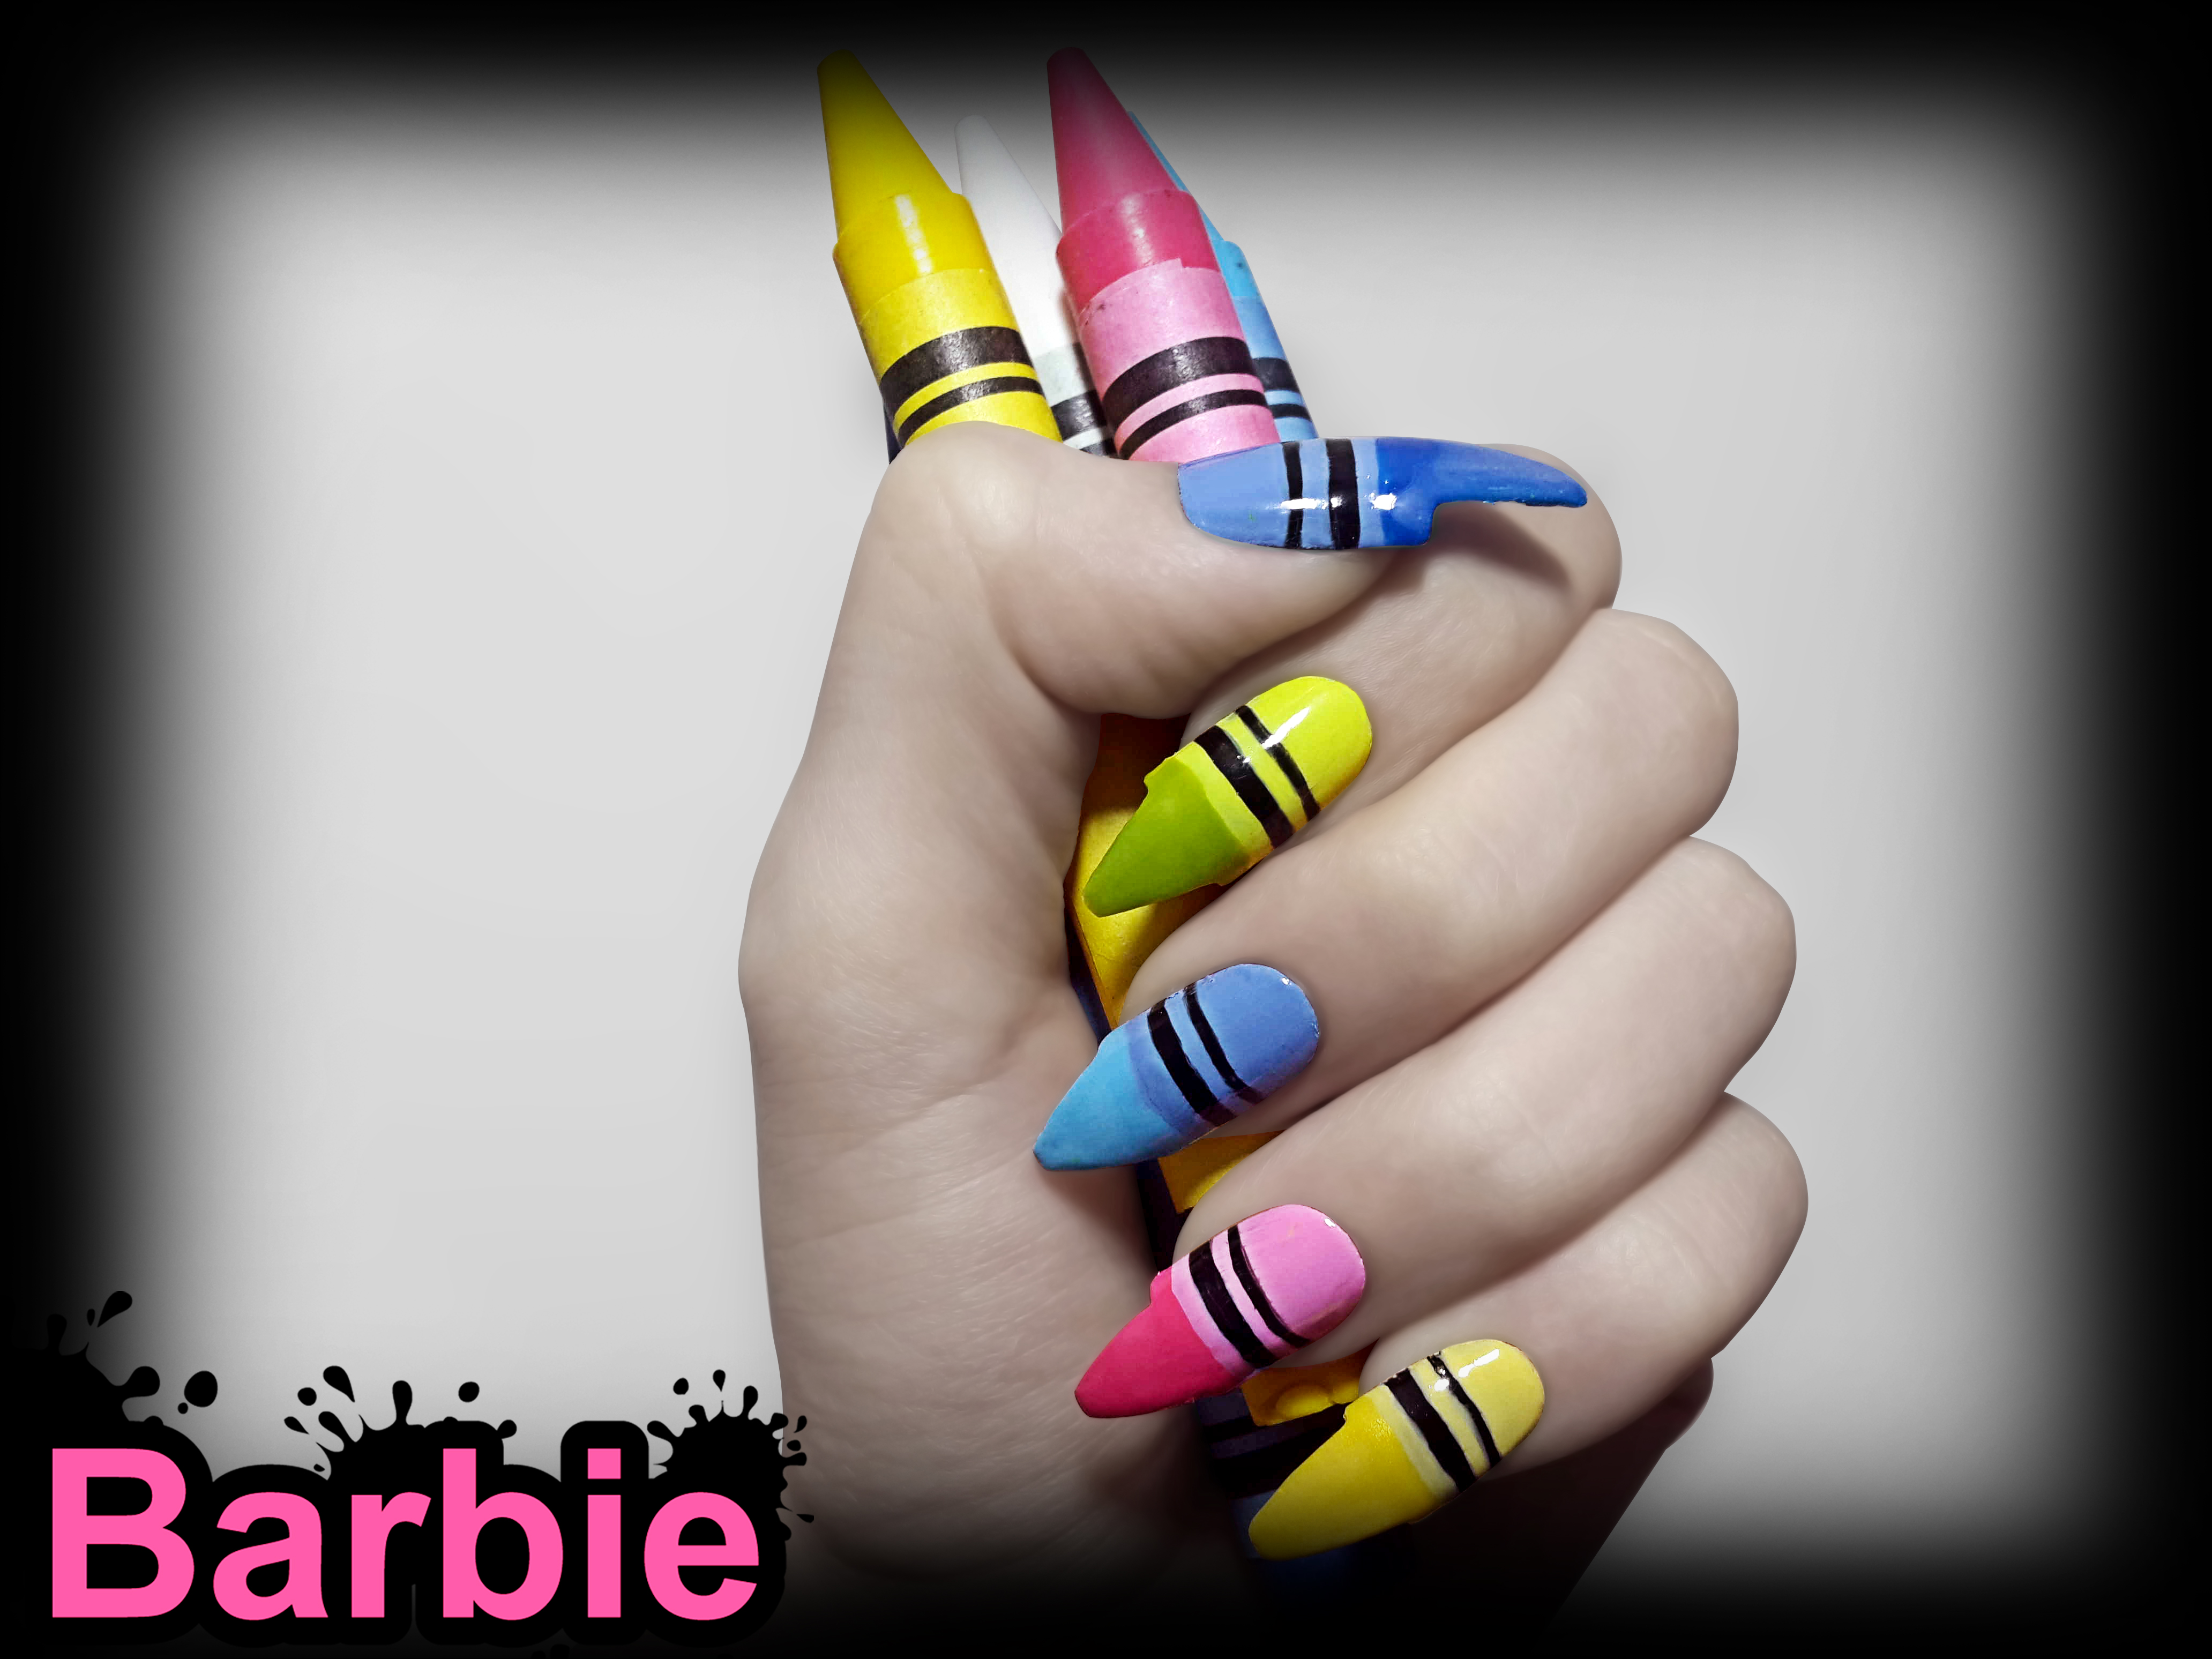 Barbie Manicure Games Splendid Wedding Company